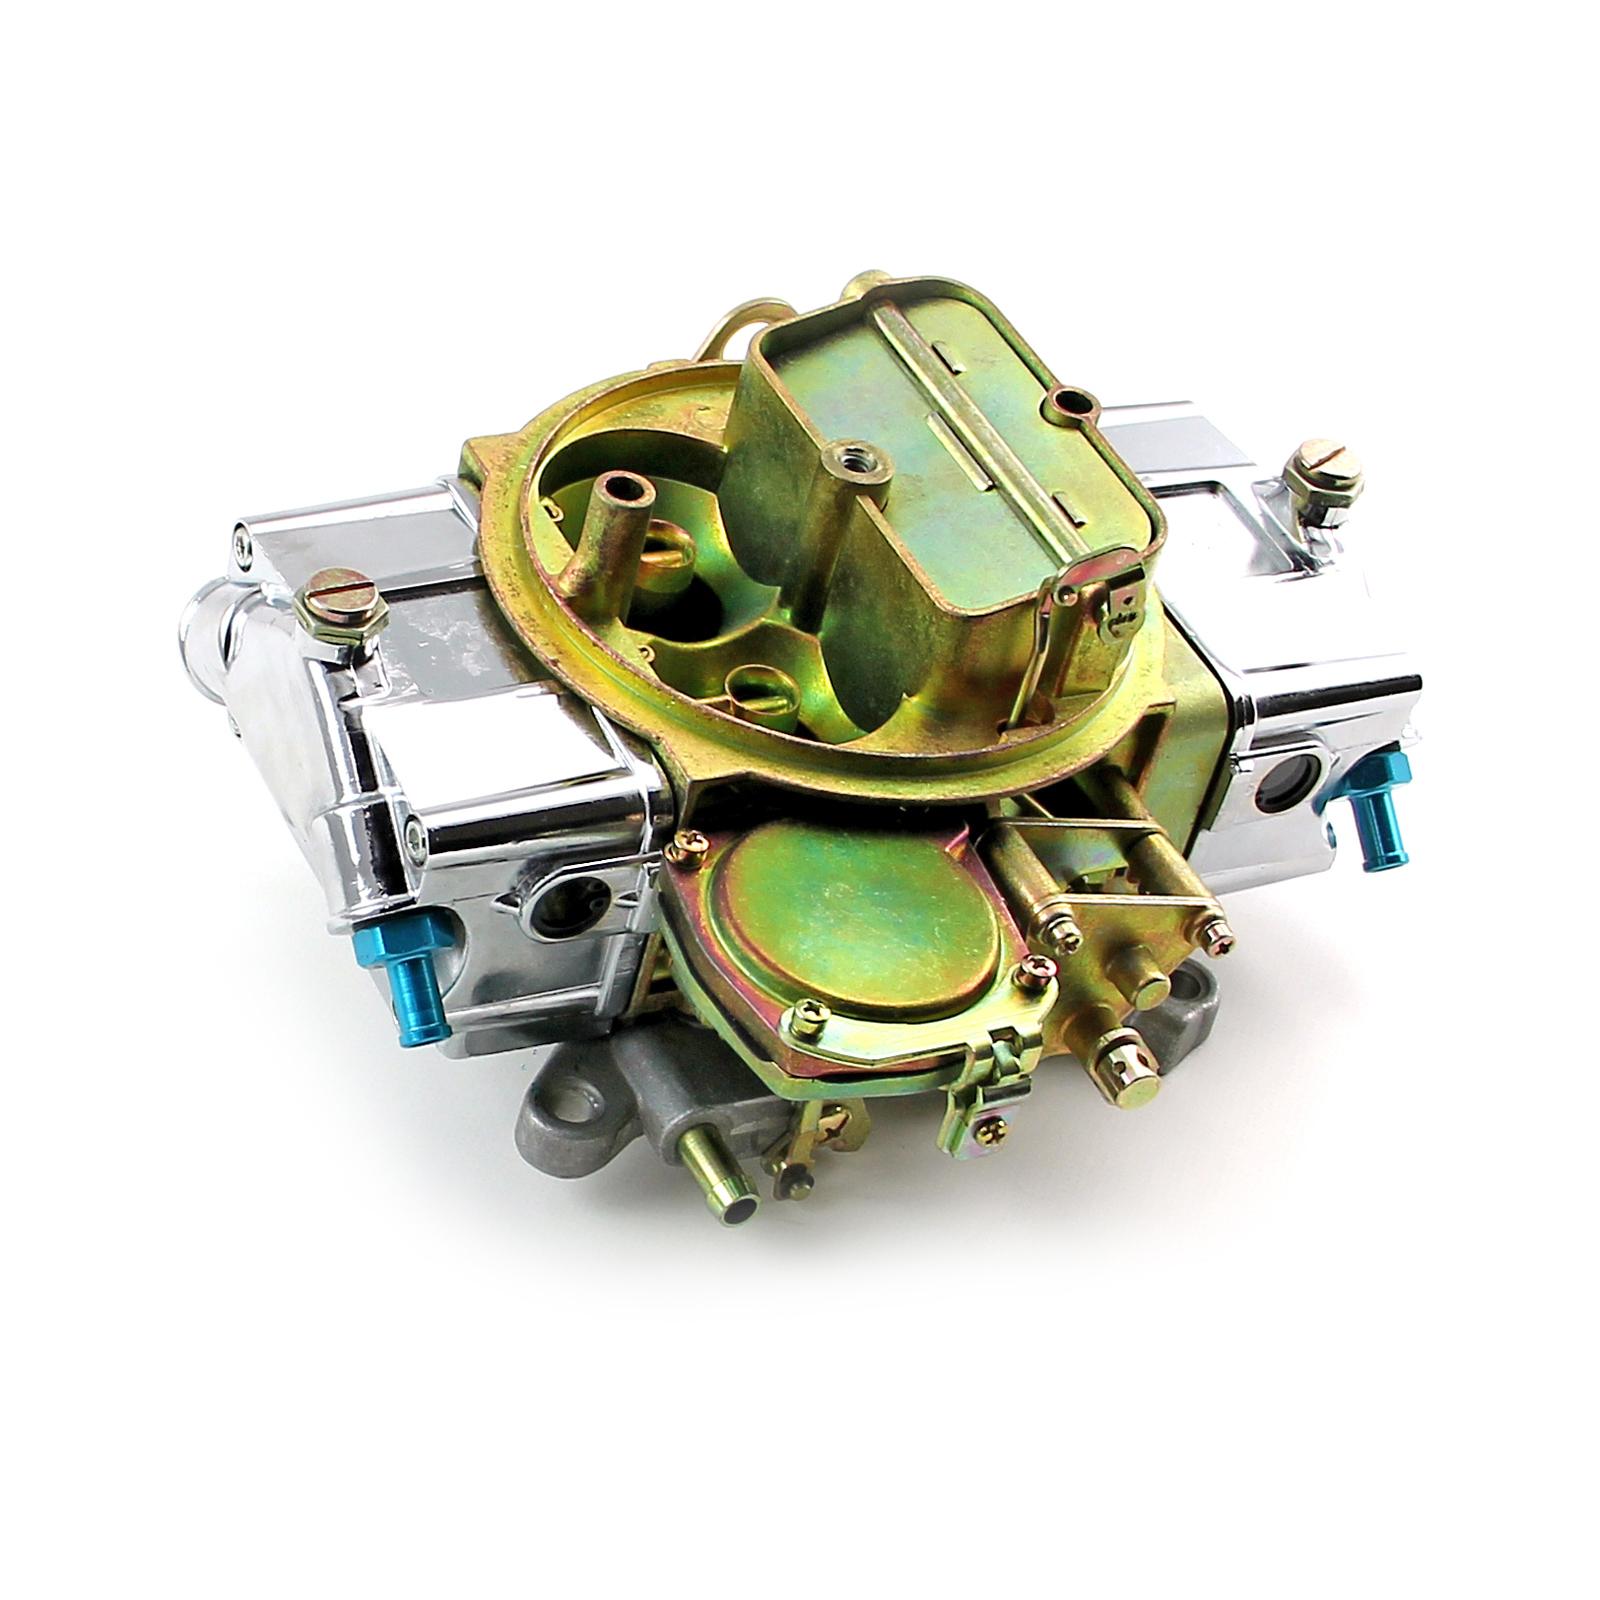 600 CFM 4 Barrel Vacuum Secondary Carburetor w/ Manual Choke USA BUILT